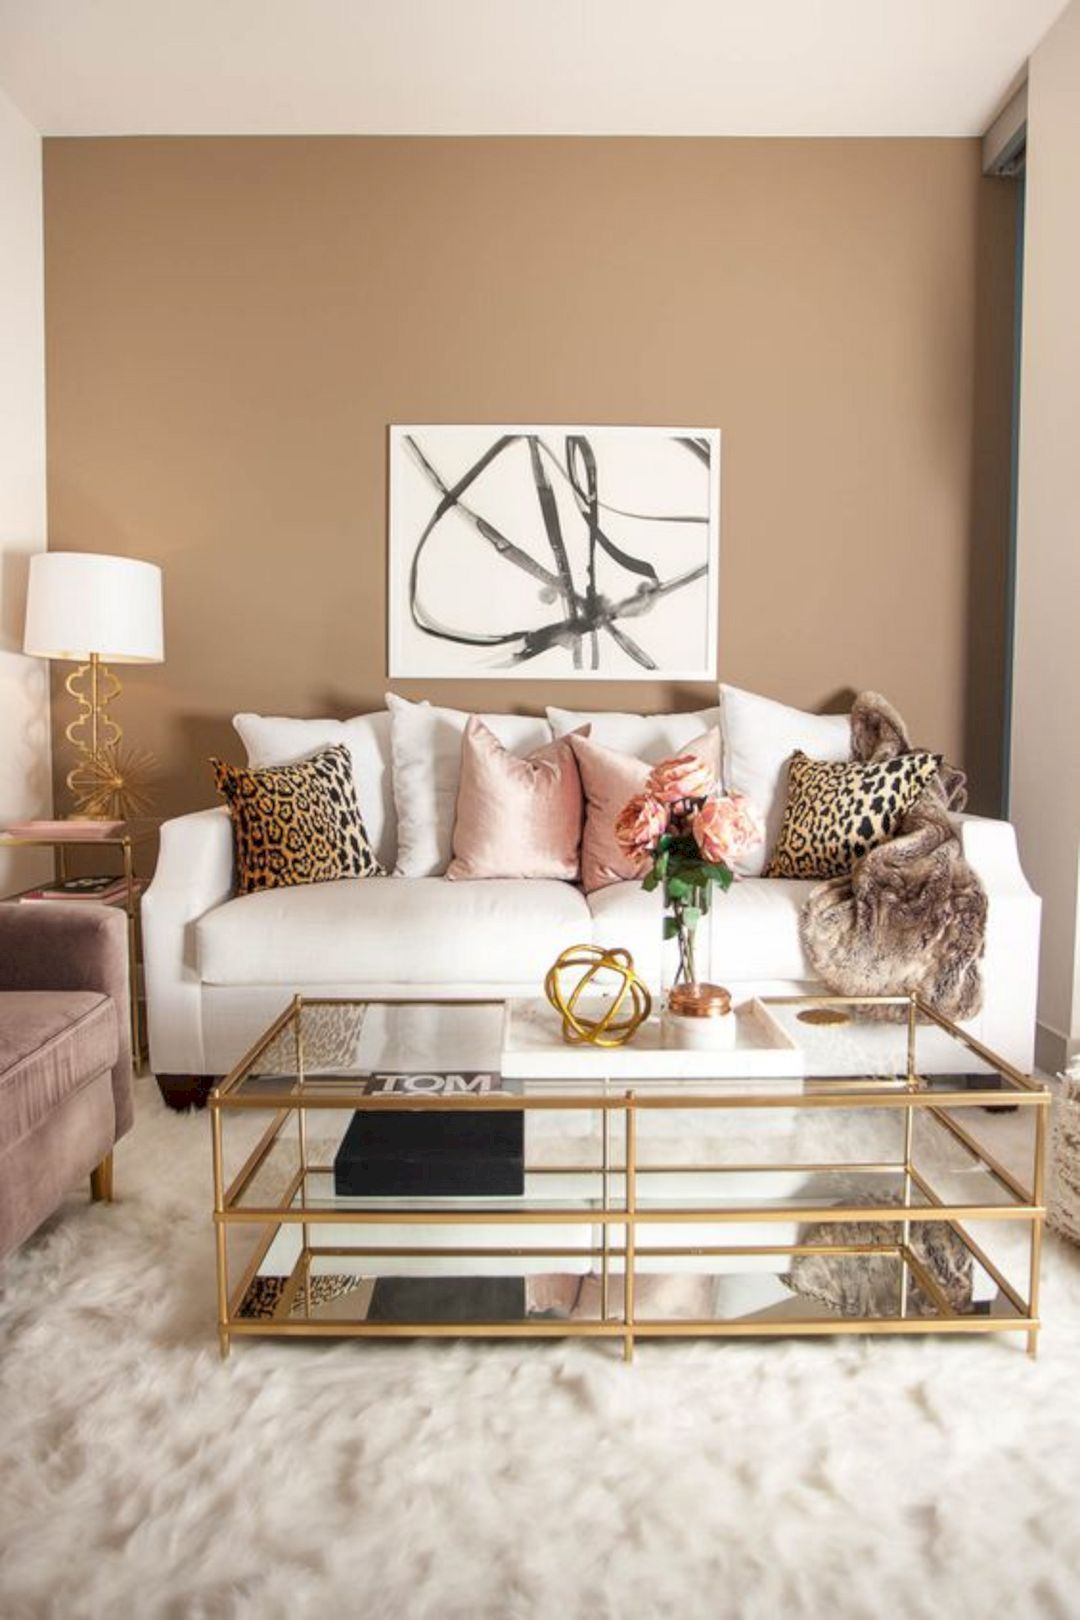 Merveilleux 17 Stunning Interior Design Ideas For Living Room  Https://www.futuristarchitecture.com/30475 Interior Design Ideas Living Room .html #luxurylivingroomdesigns